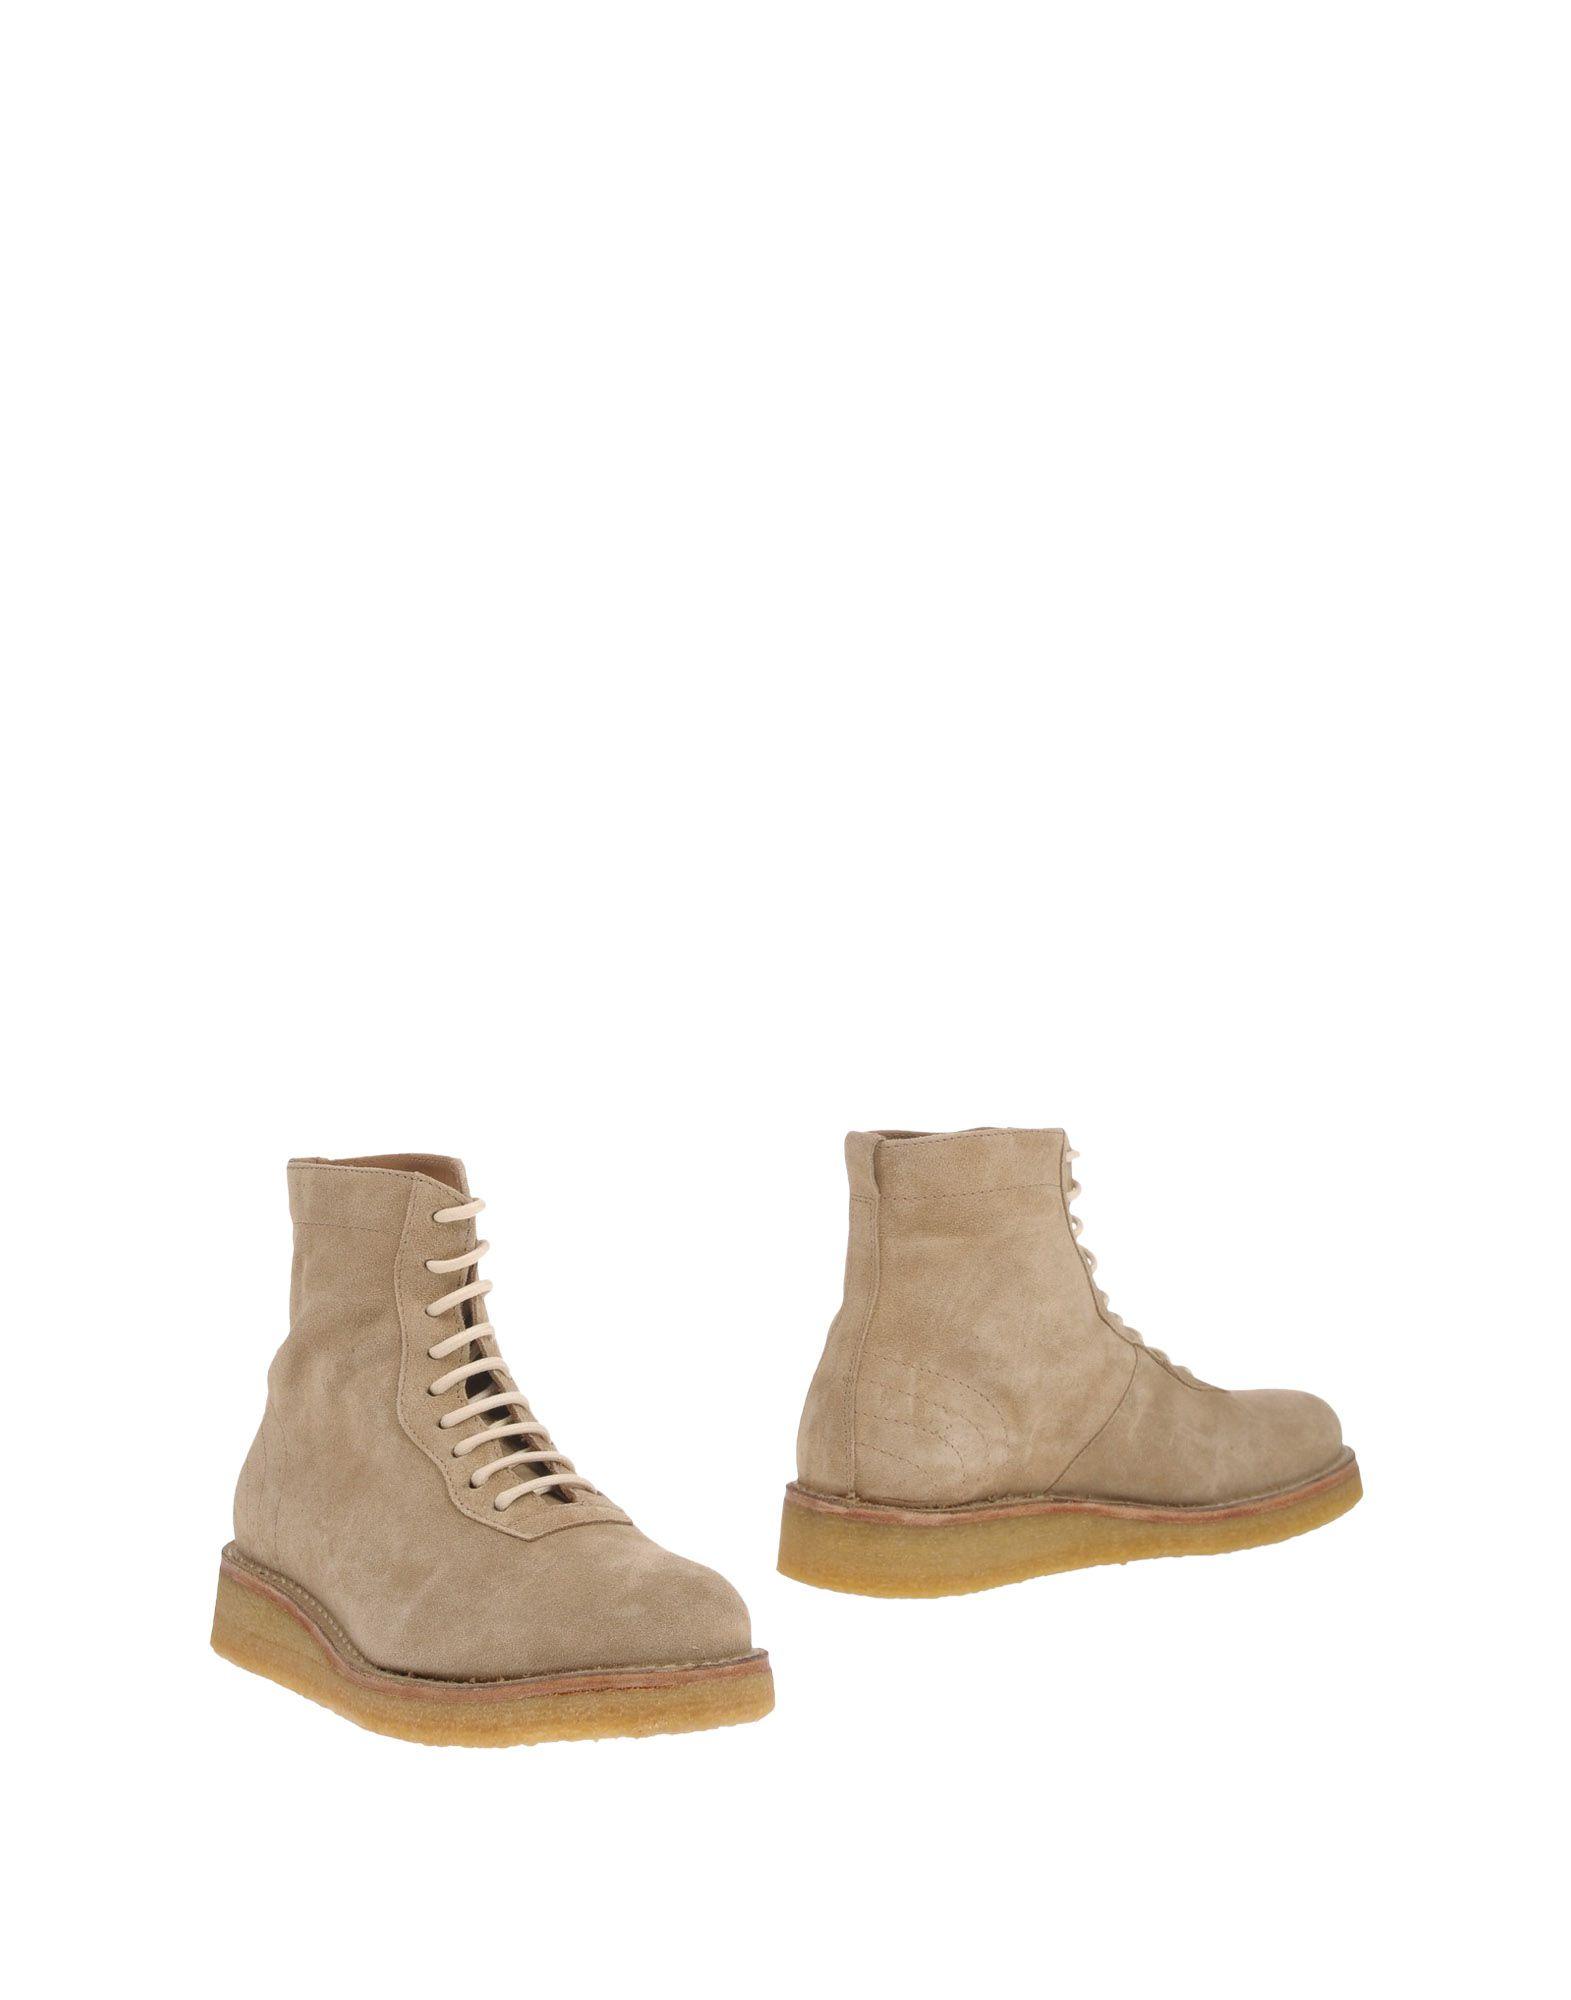 Stivaletti Pantofola D'oro Donna - 11221065XT